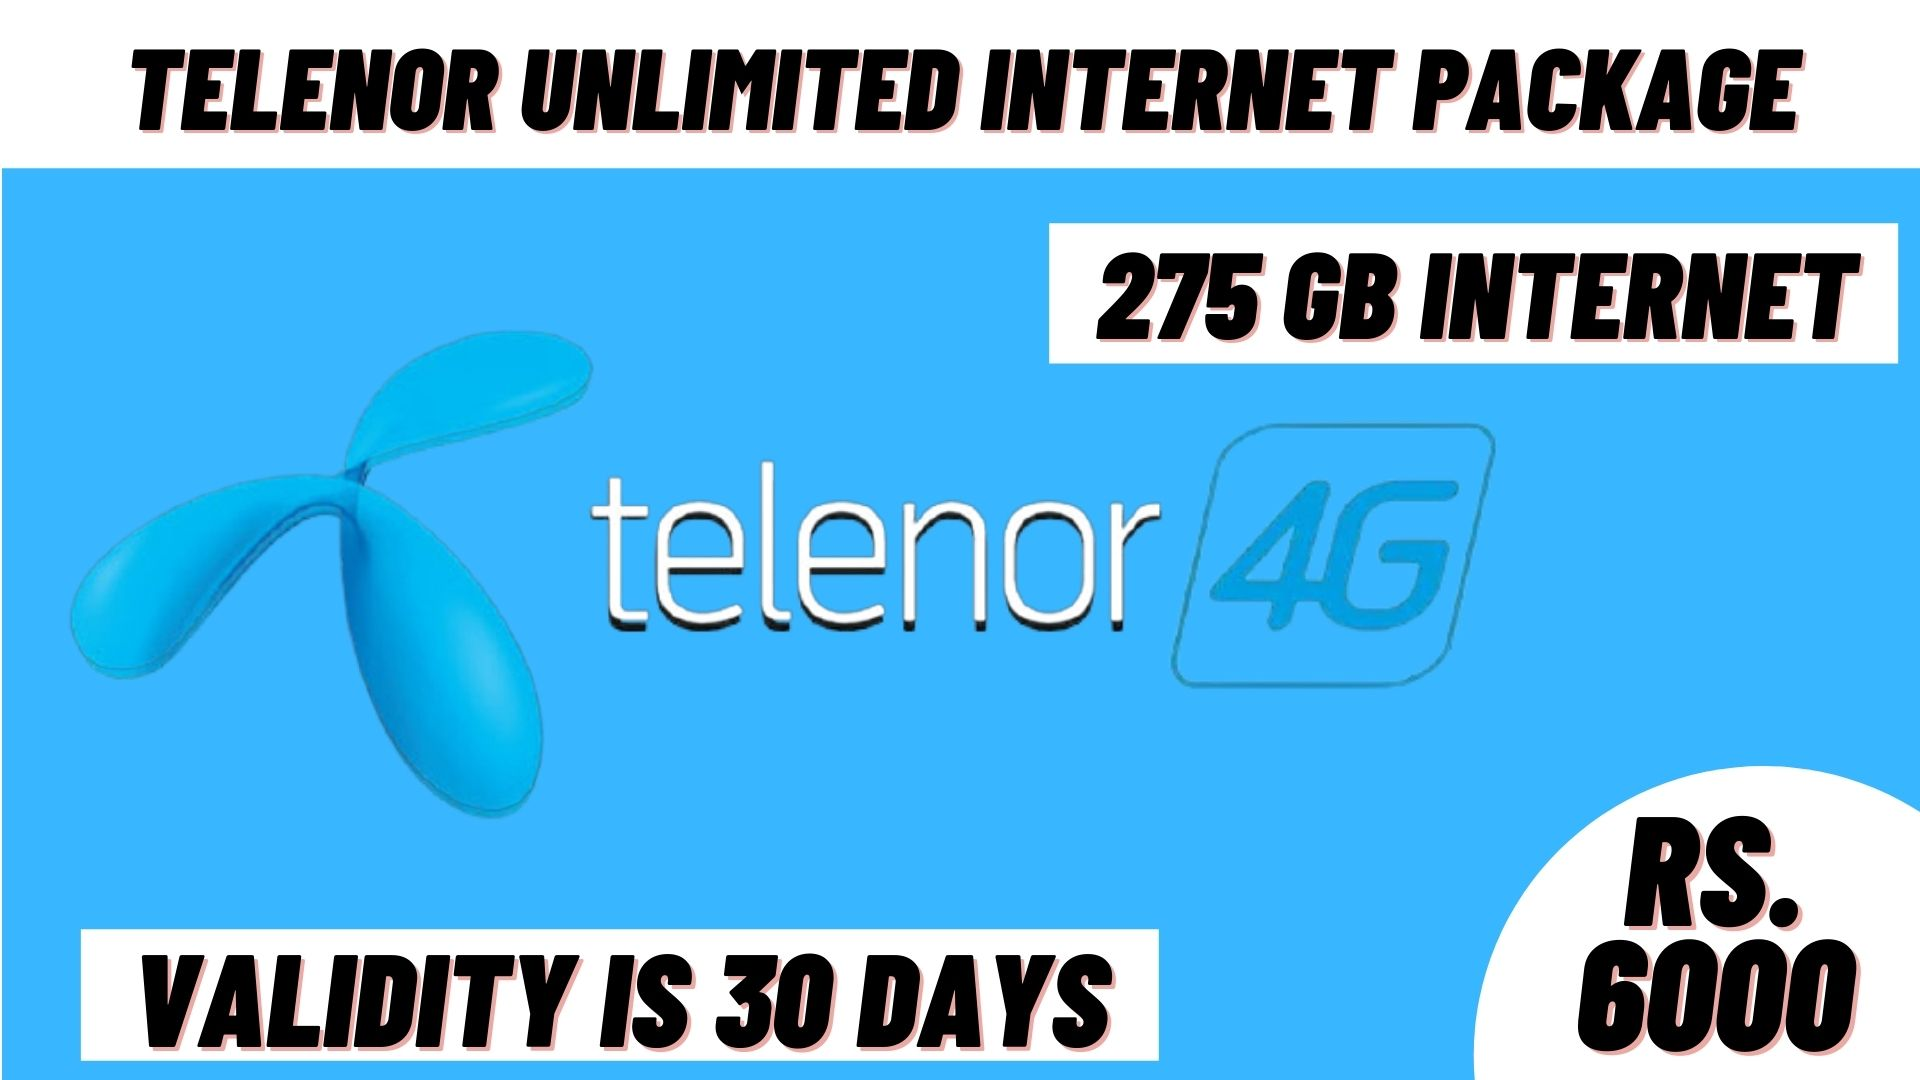 telenor unlimited internet package